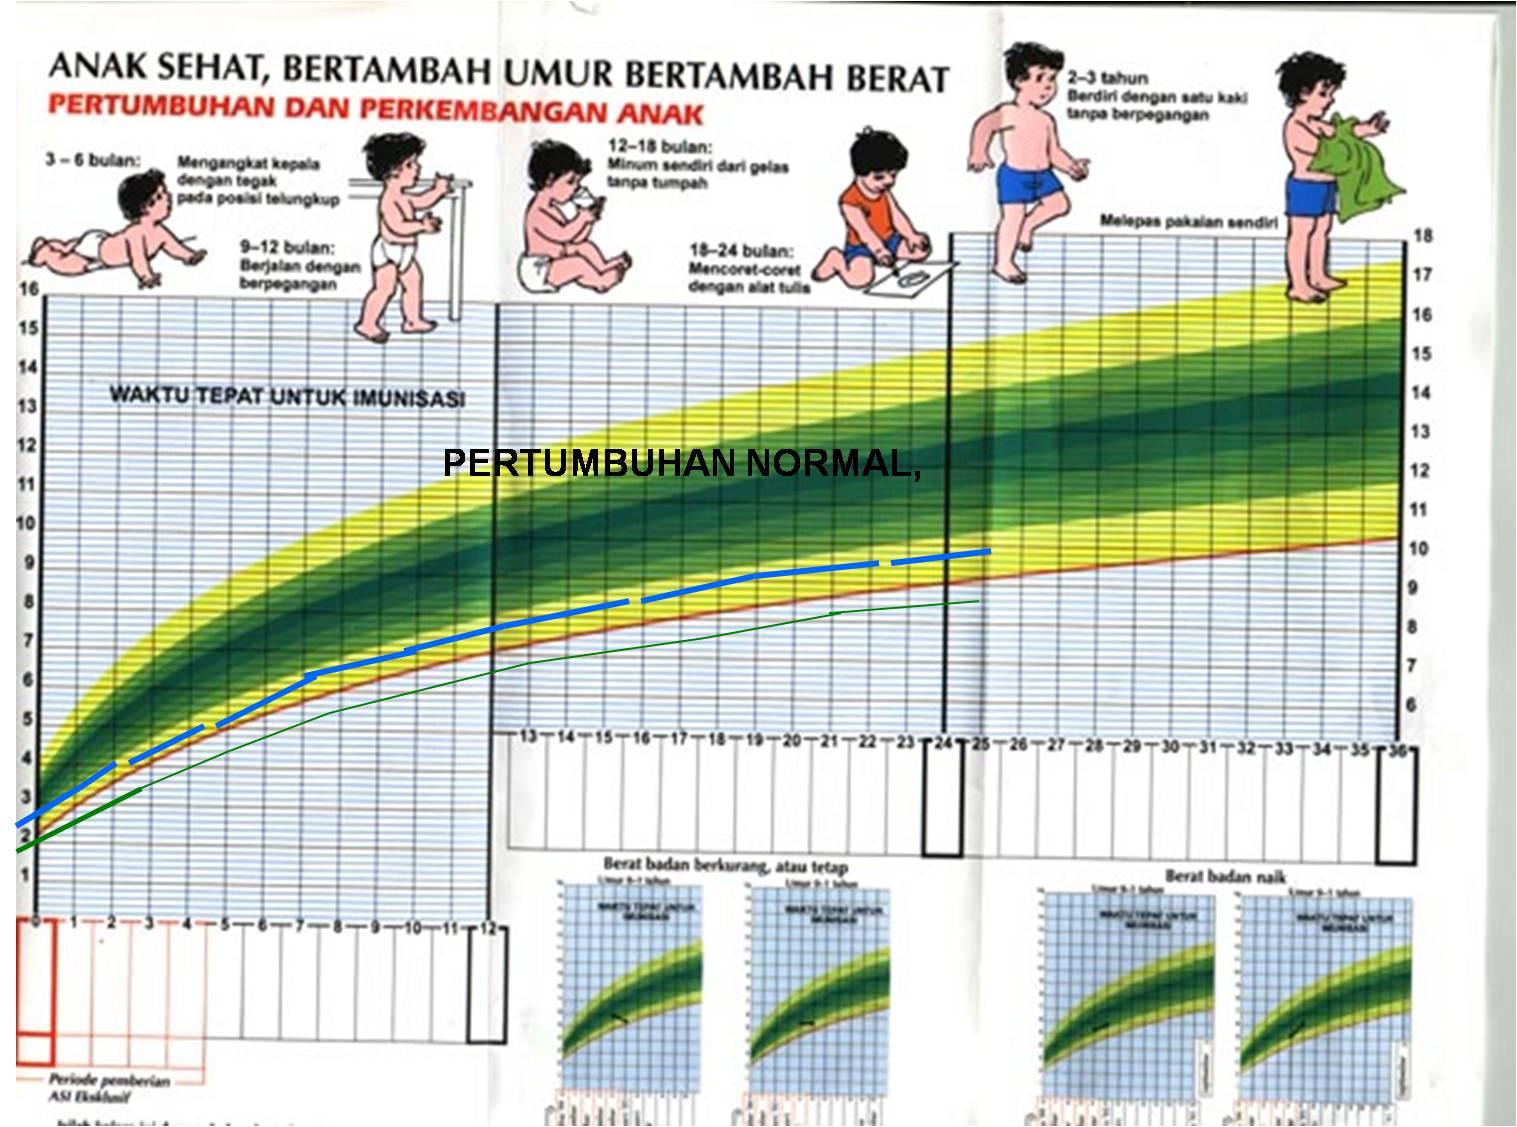 Berat Badan & Tinggi Normal Bayi 9 Bulan